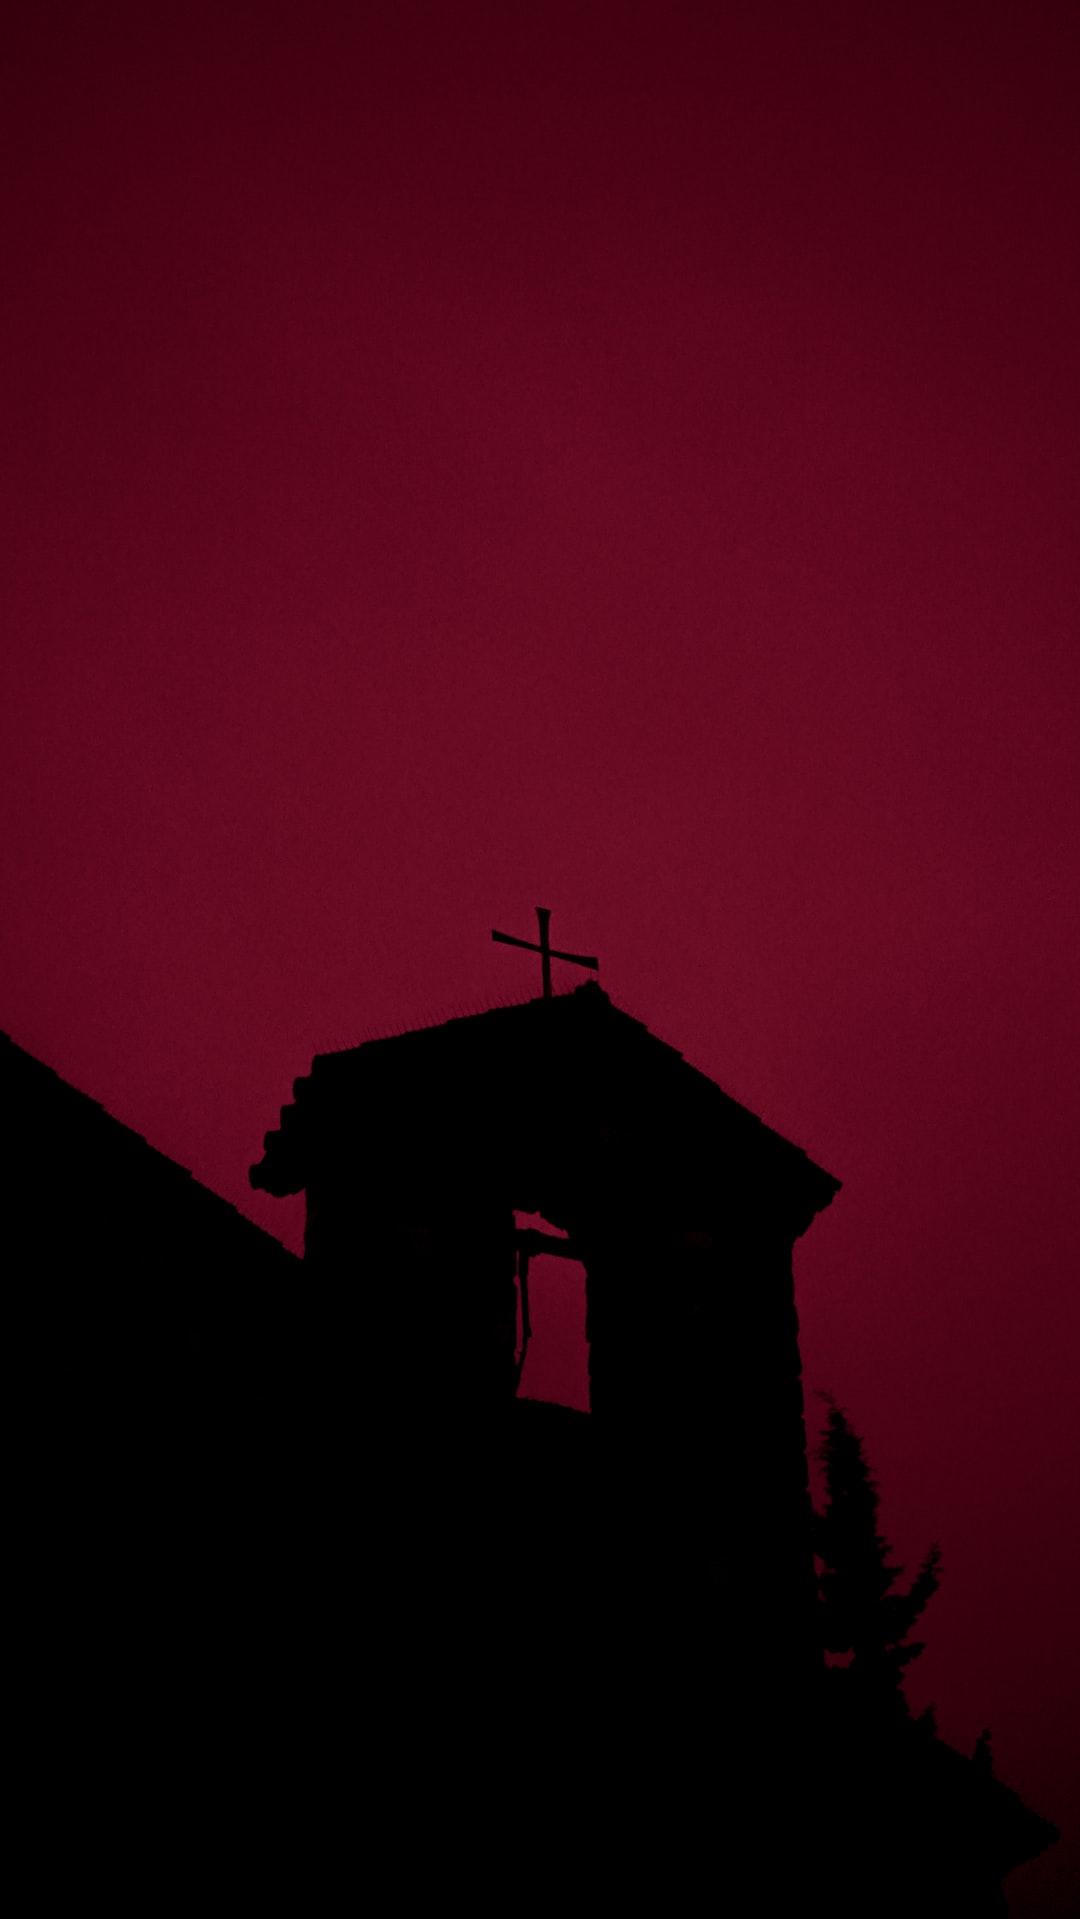 Just a creepy looking church.